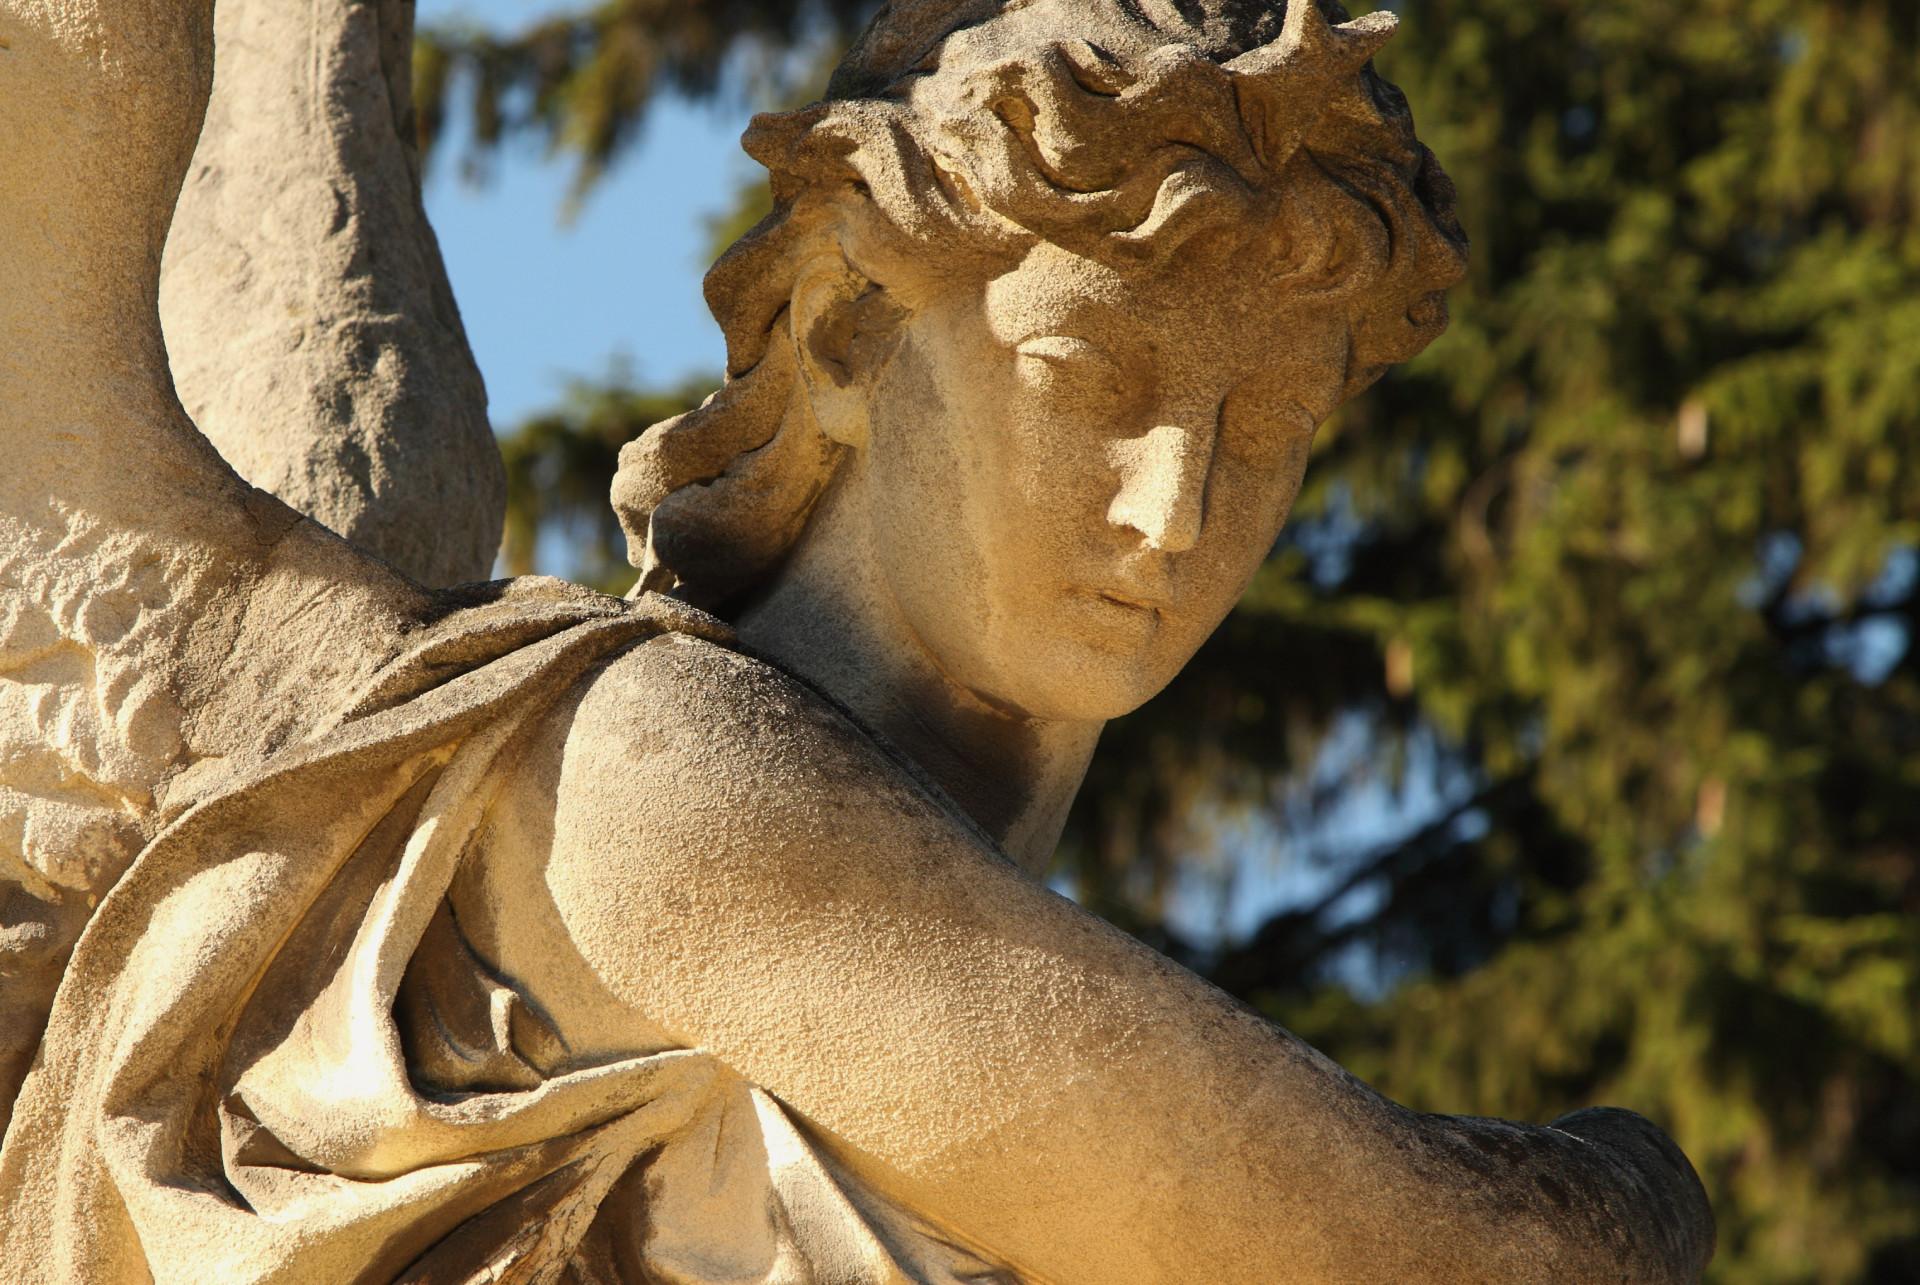 Venus, la diosa del sistema solar